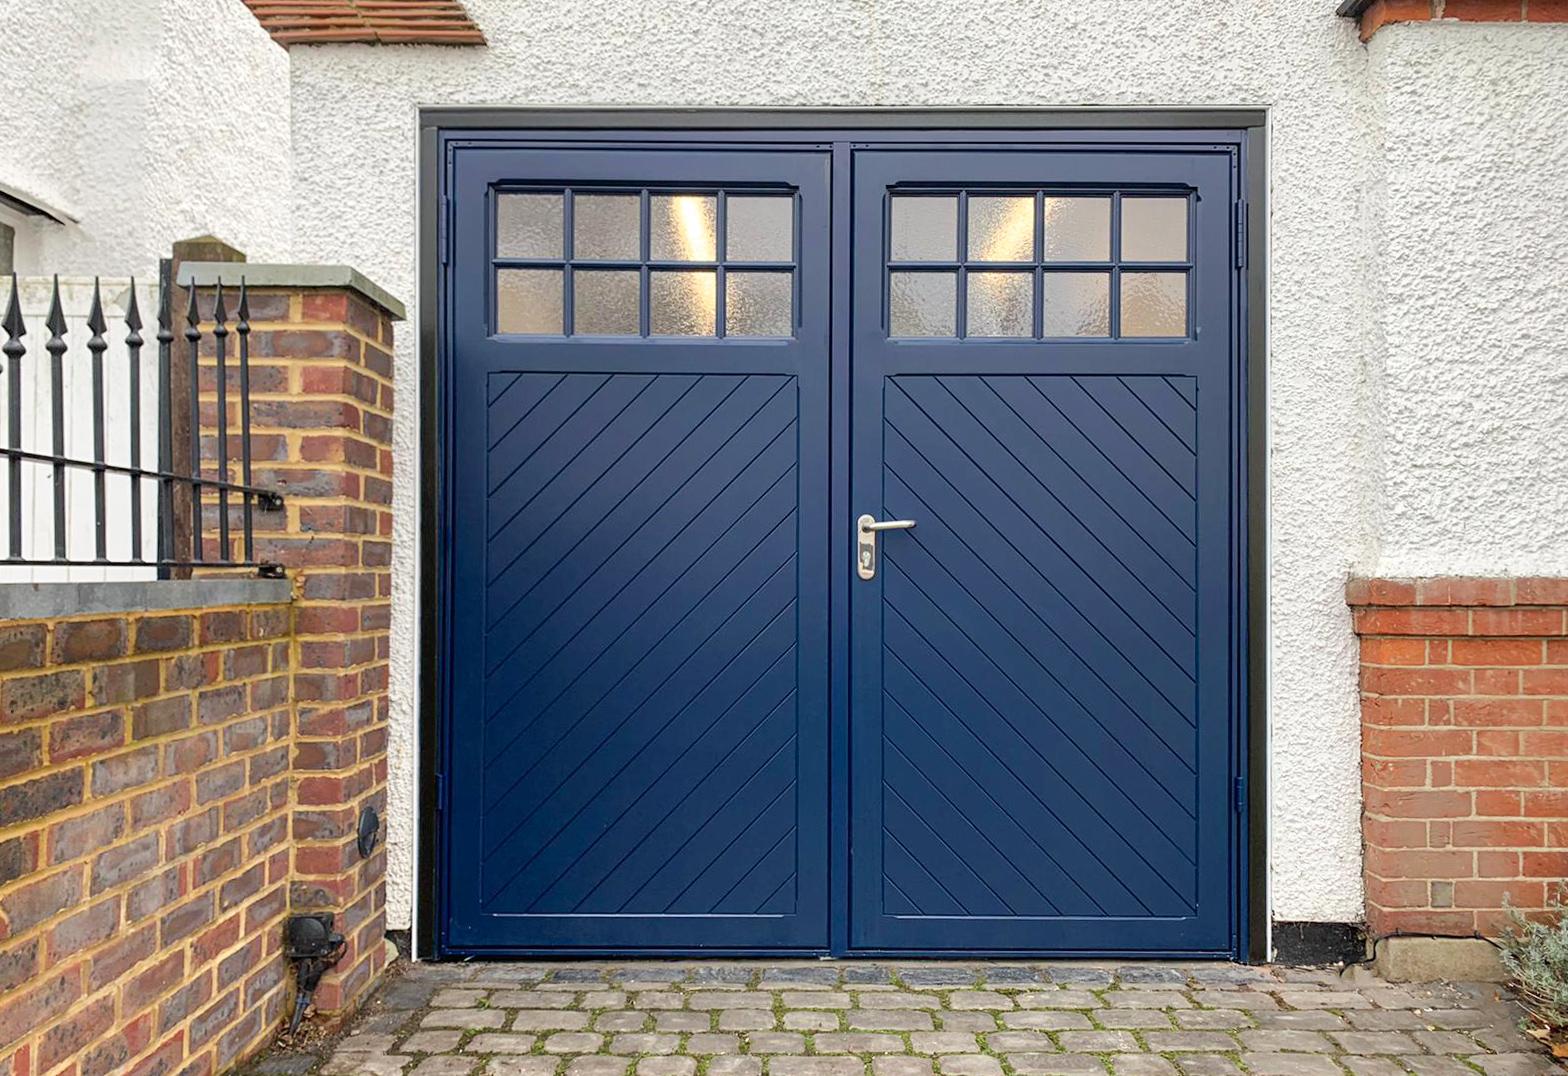 Garador Ashton, 50:50 Side Hinged Garage Doors Finished in Steel Blue